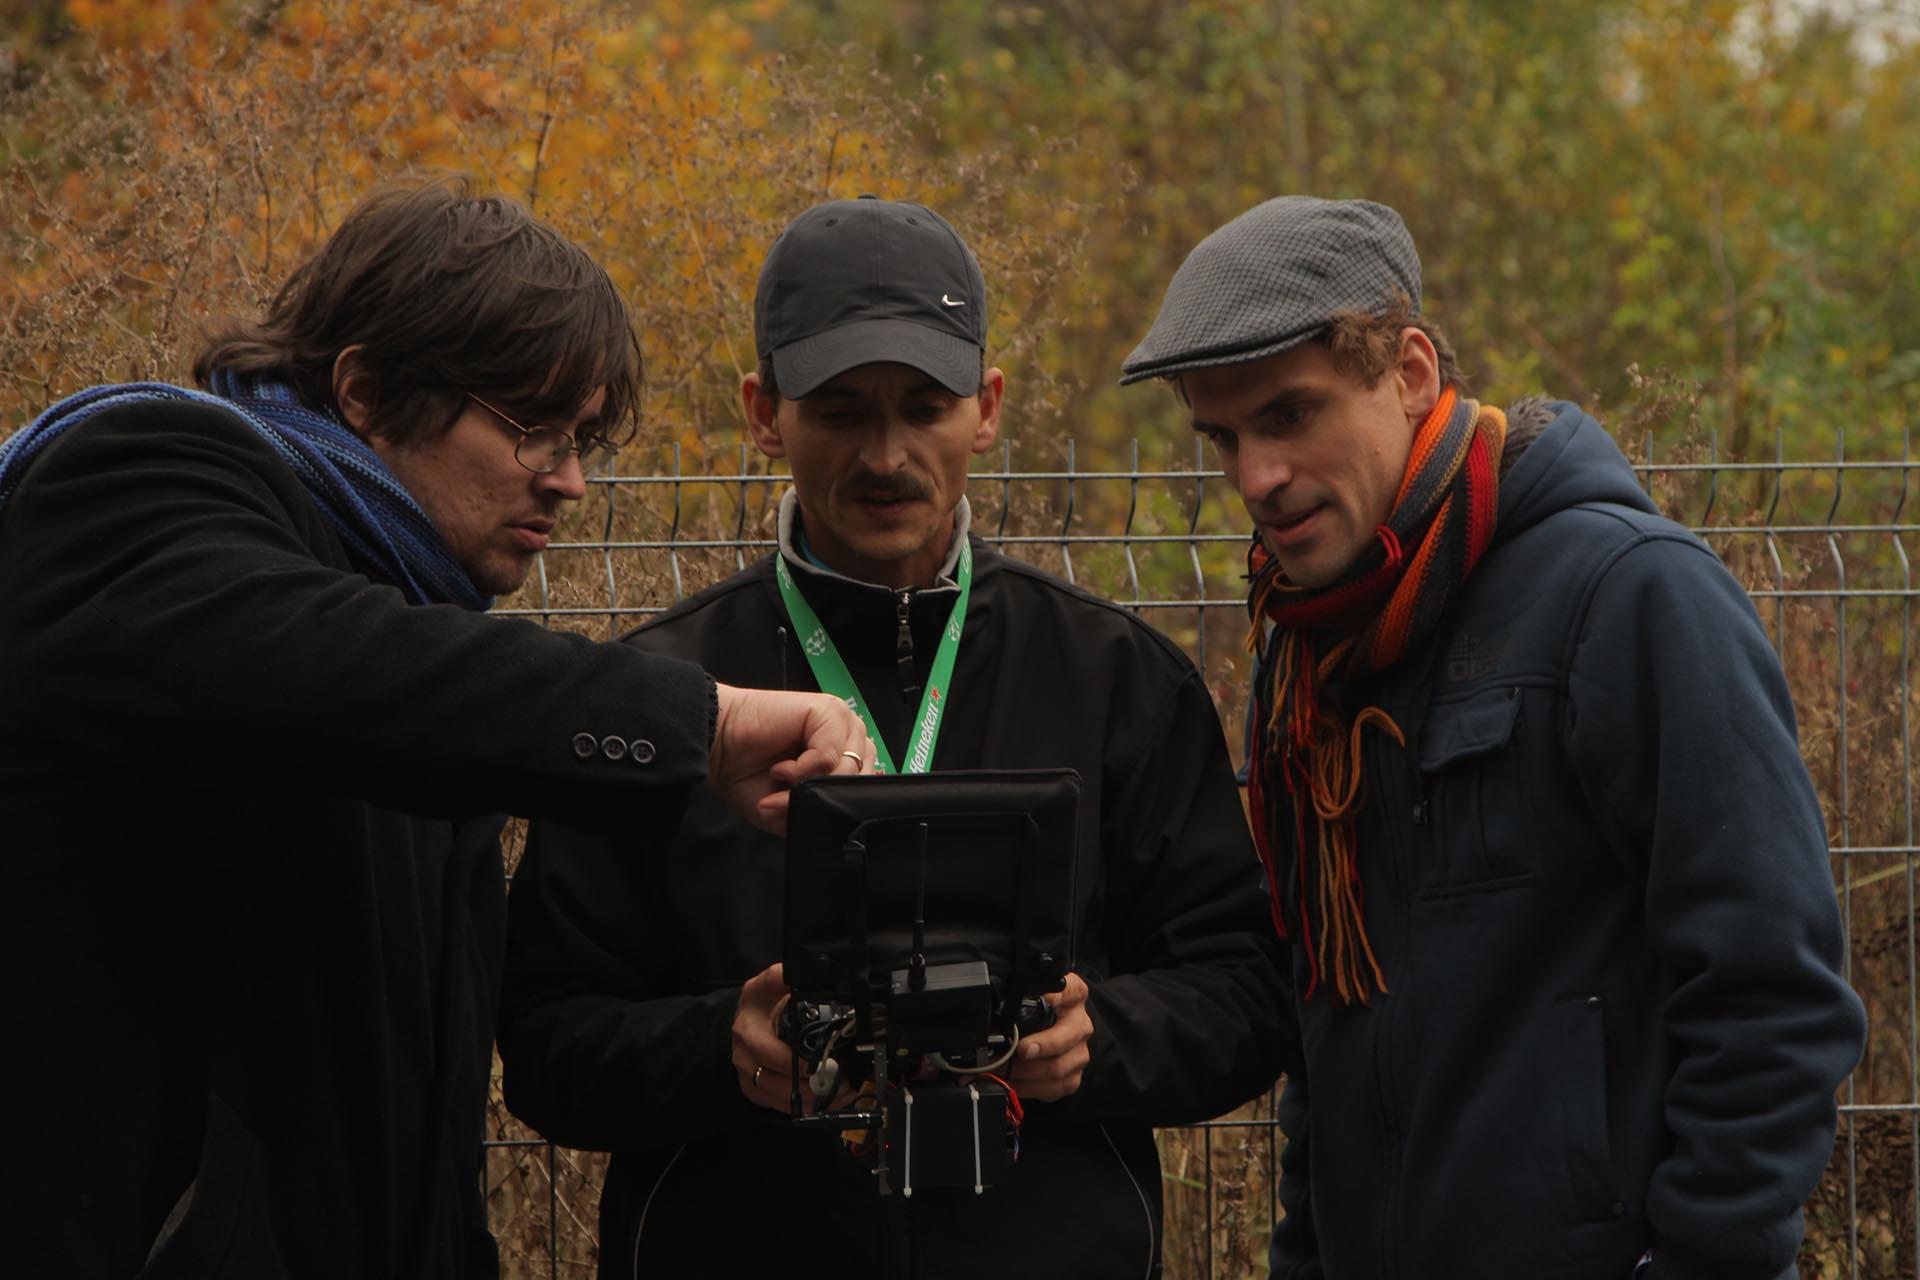 zdjęcie making of z filmu Cembrit referencje